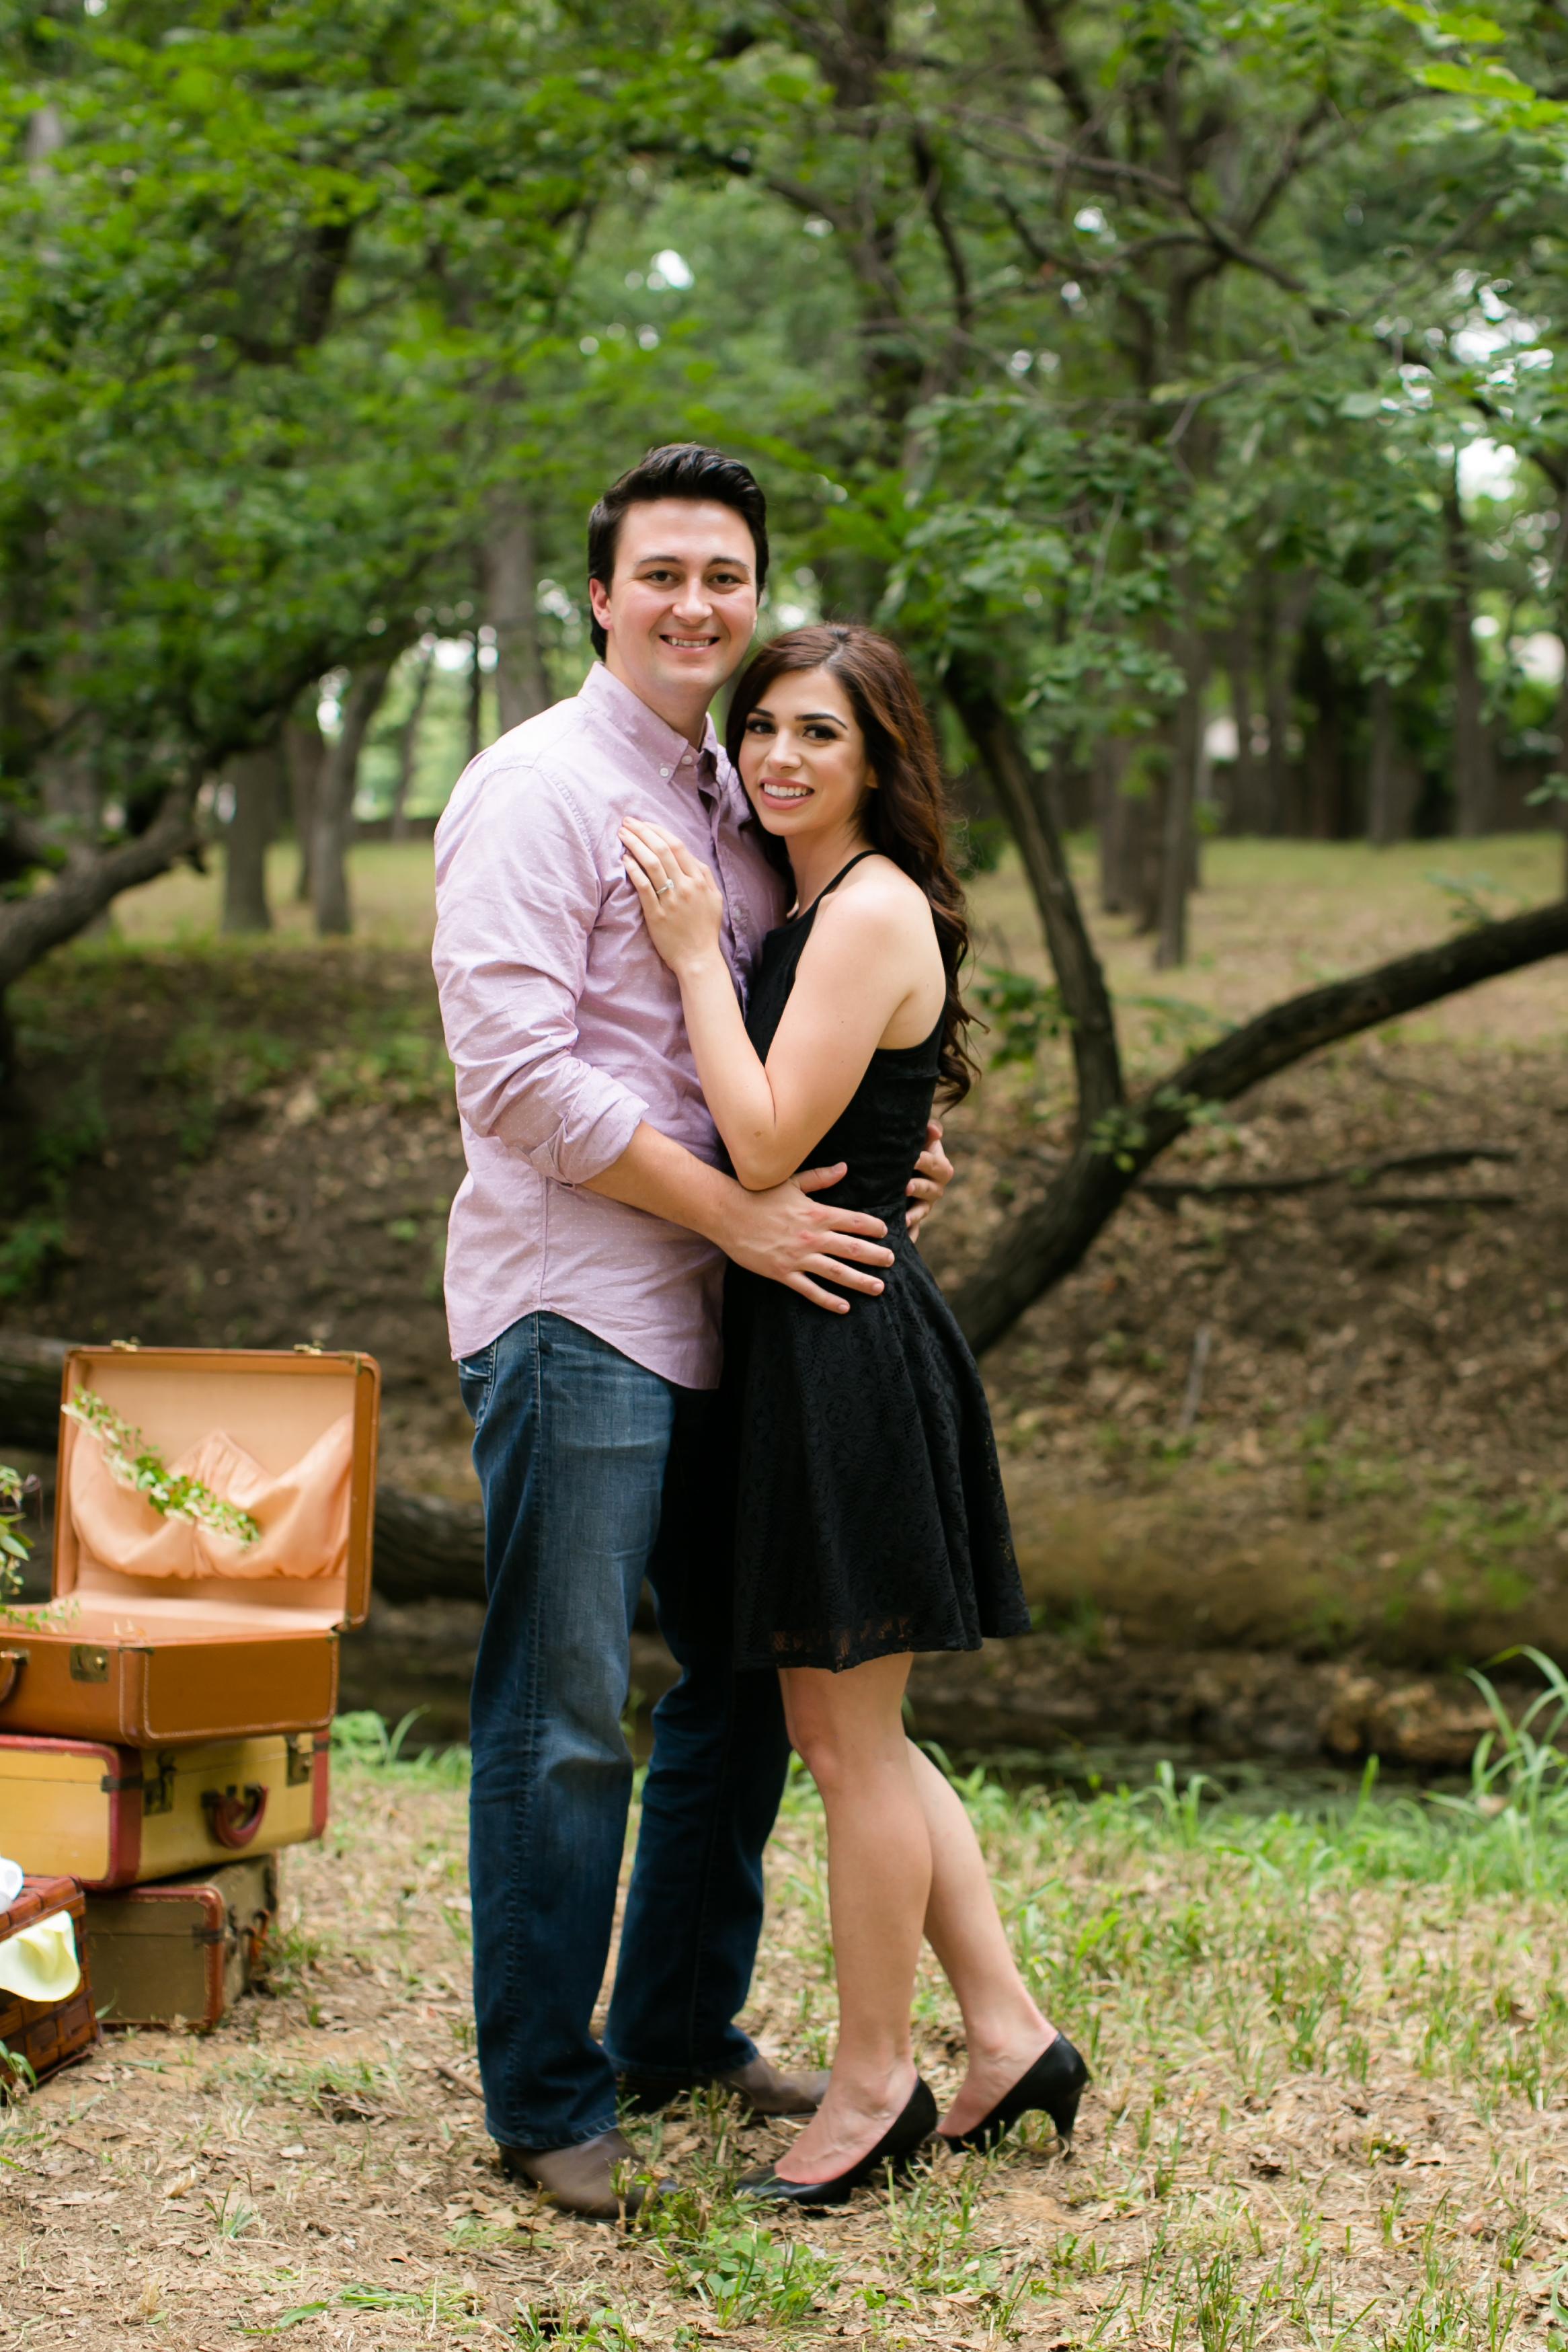 Engagement Proposal Rent My Dust vintage rentals  (2).jpg